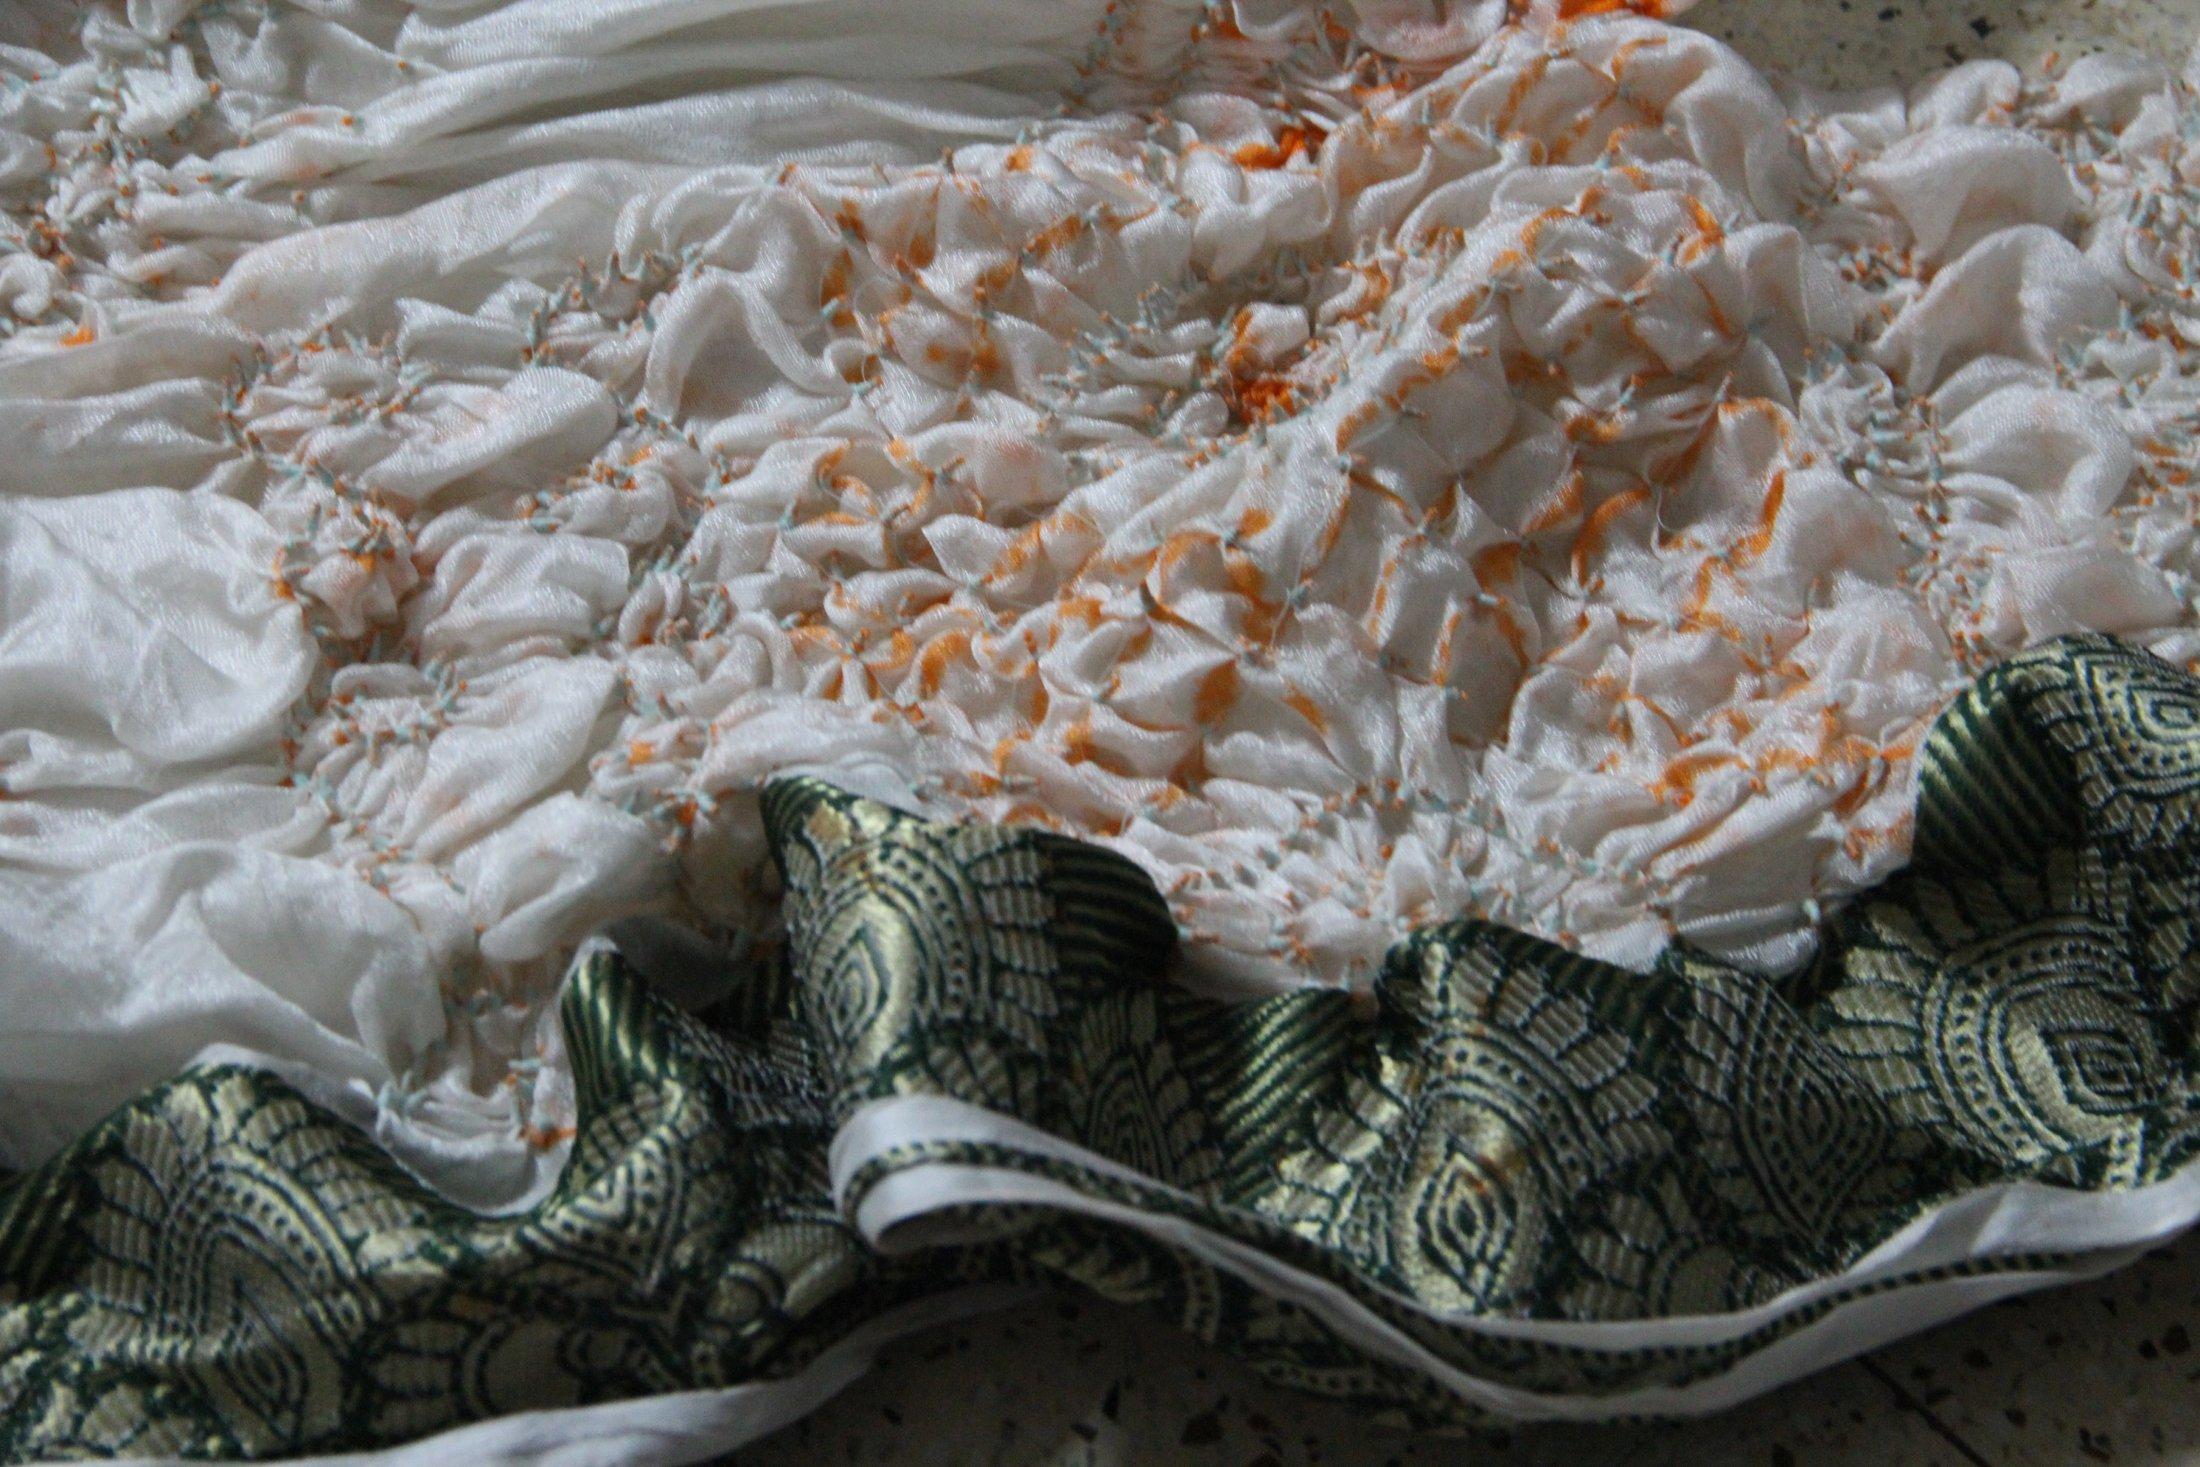 Tie-Dye Textiles